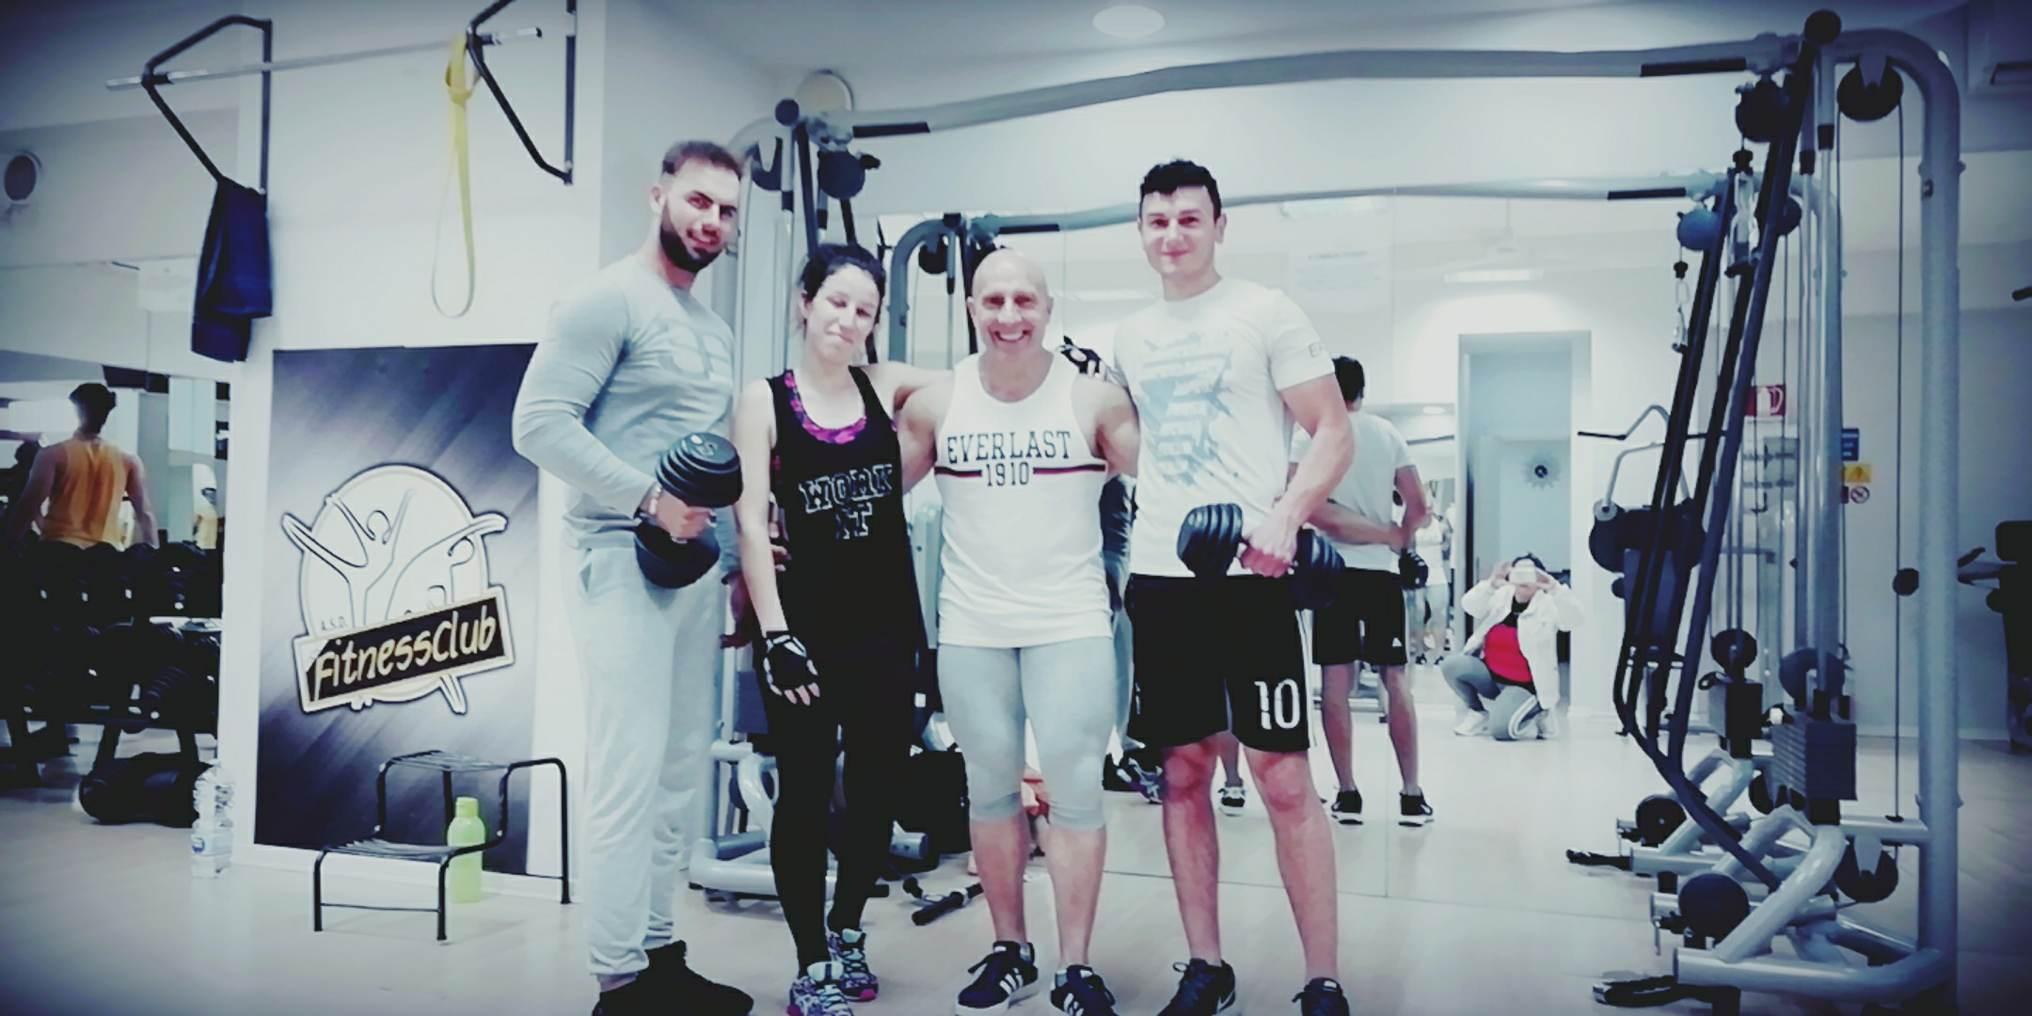 New Fitness Club a Termini Imerese